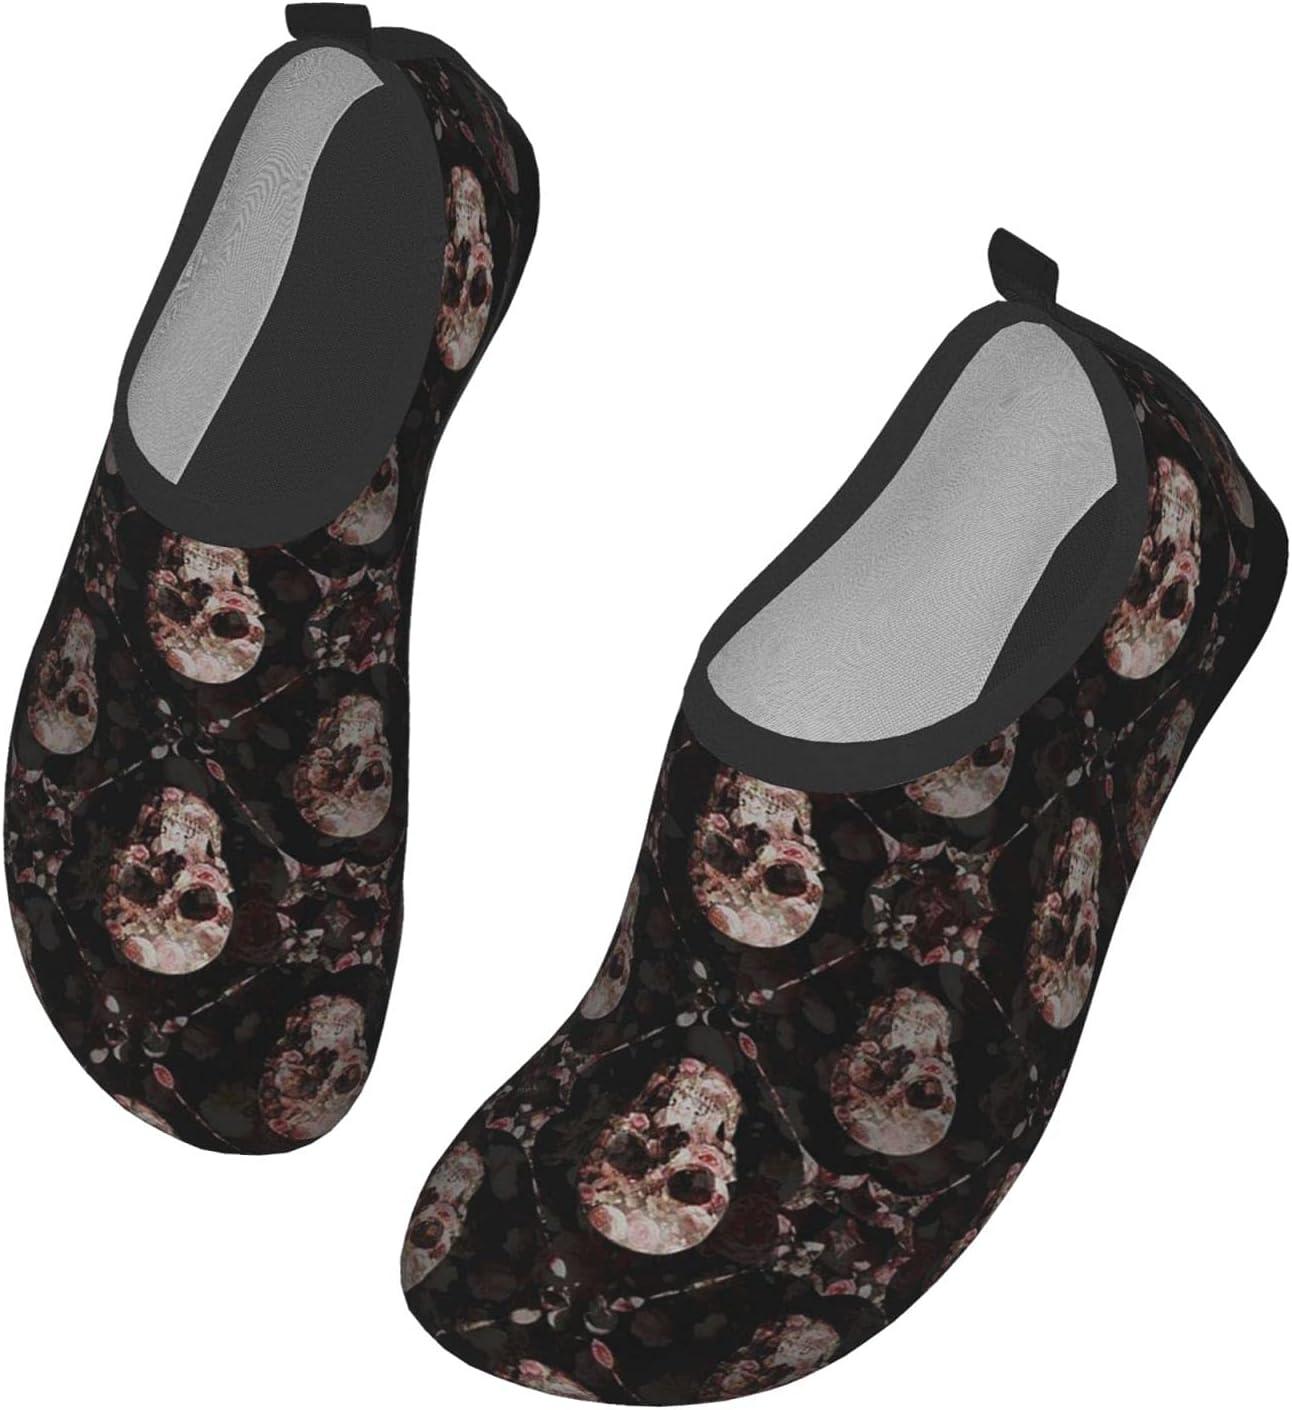 Womens Mens Summer Water Shoes Skull and Bones Floral Flower Barefoot Shoe Quick Dry Aqua Socks